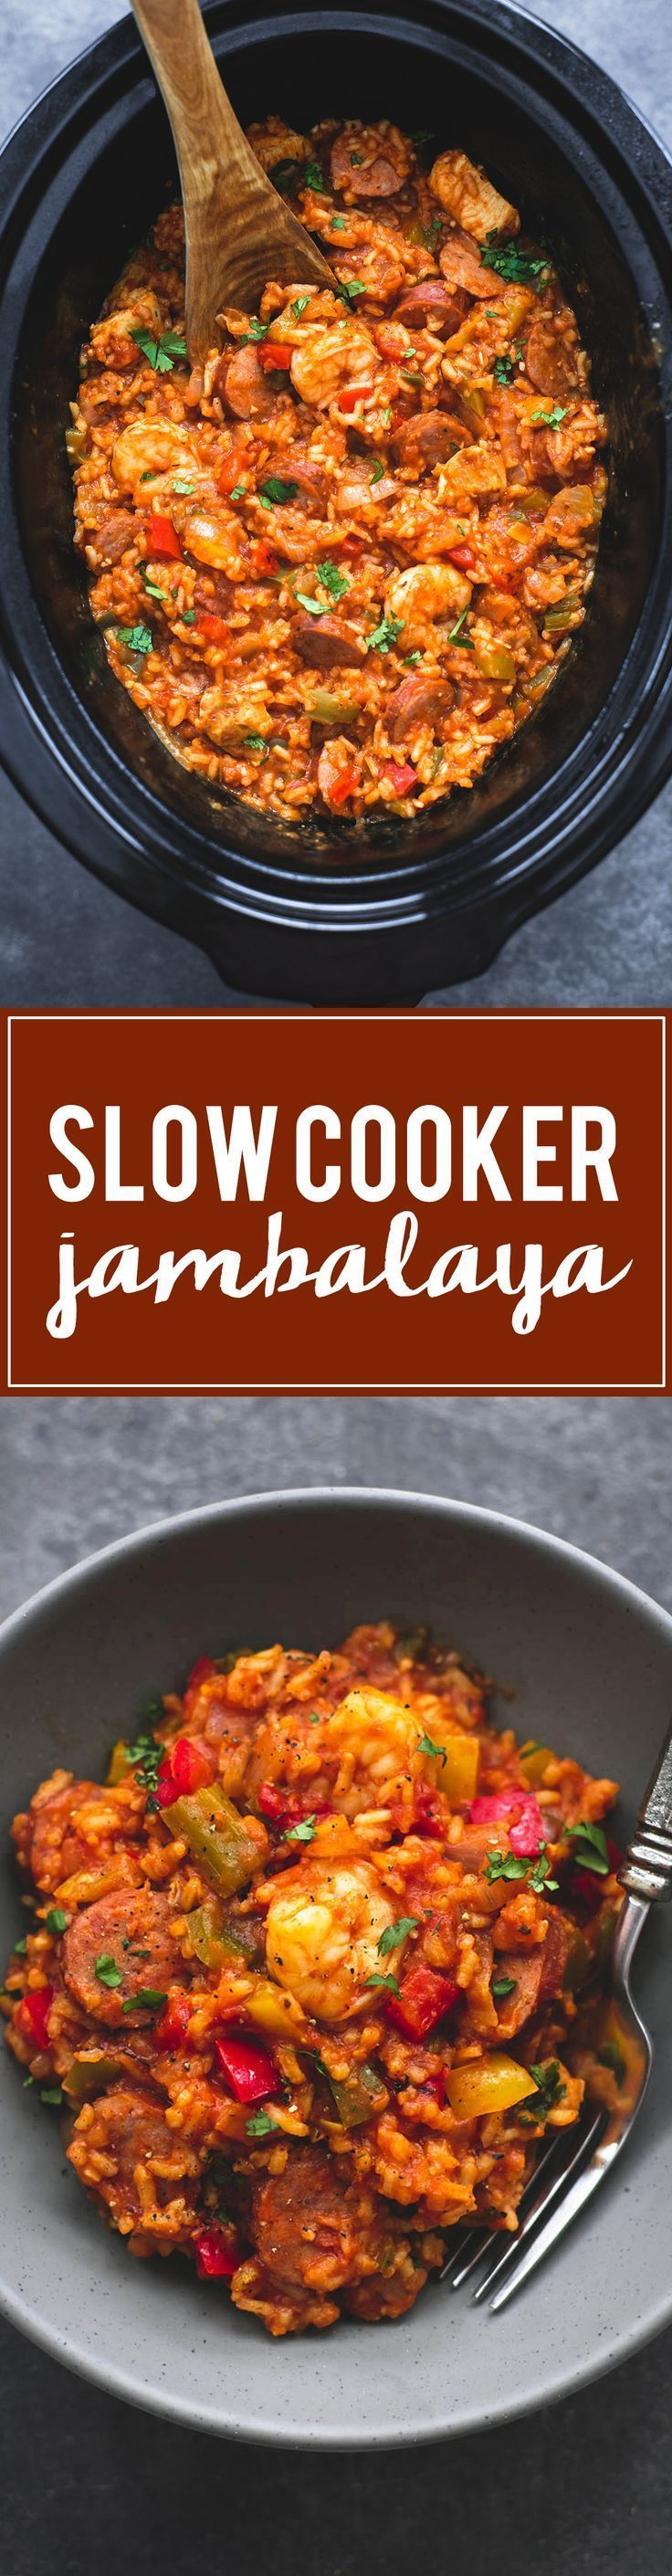 Easy and flavorful Slow Cooker Jambalaya   http://lecremedelacrumb.com